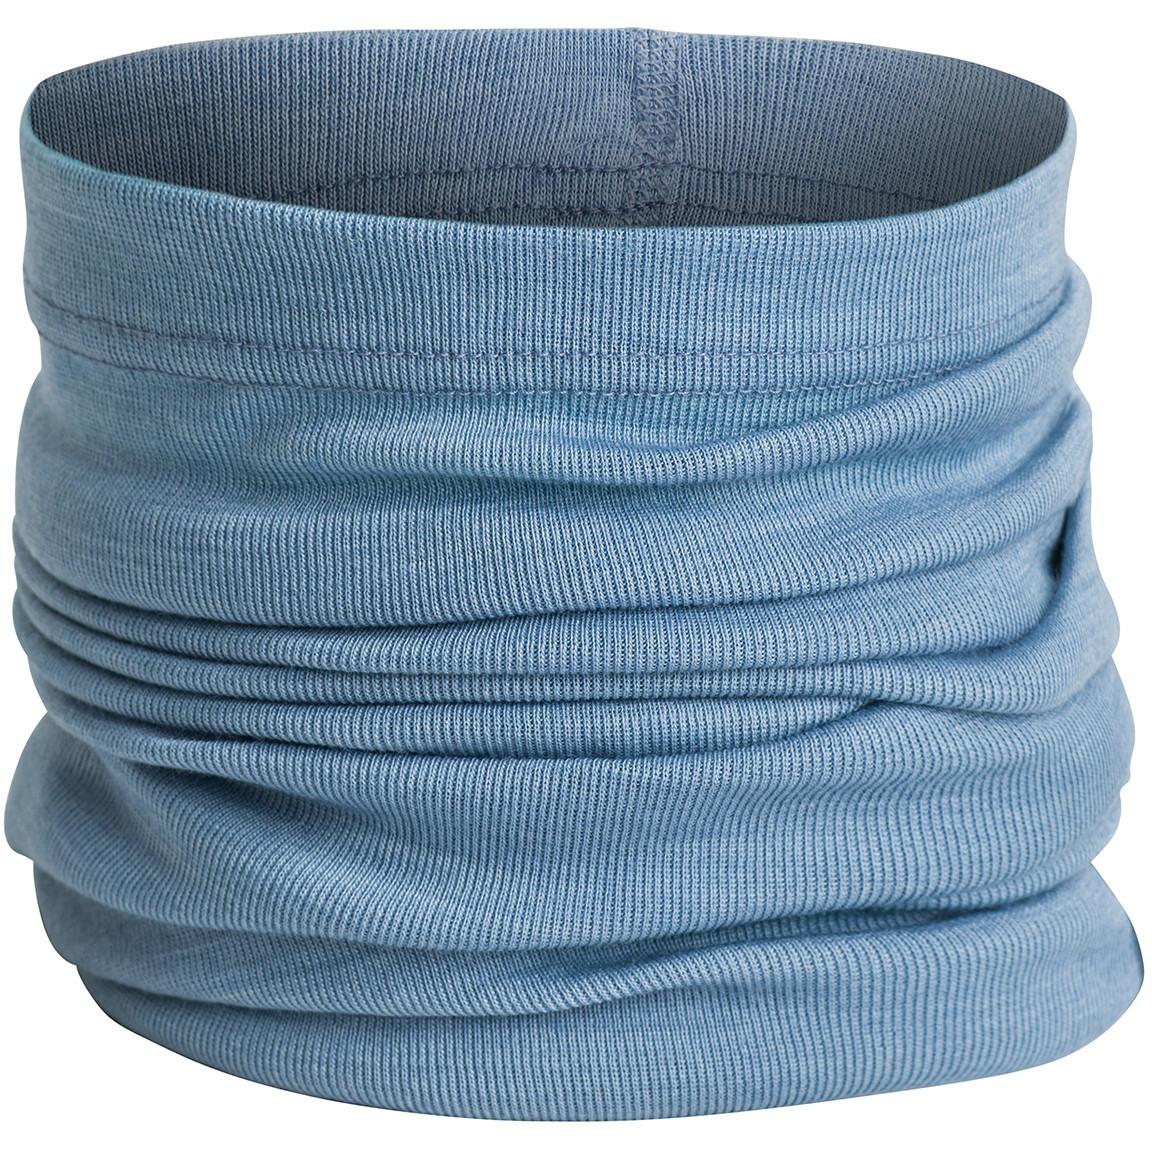 Woolpower Tube LITE Multifunctional Cloth - nordic blue